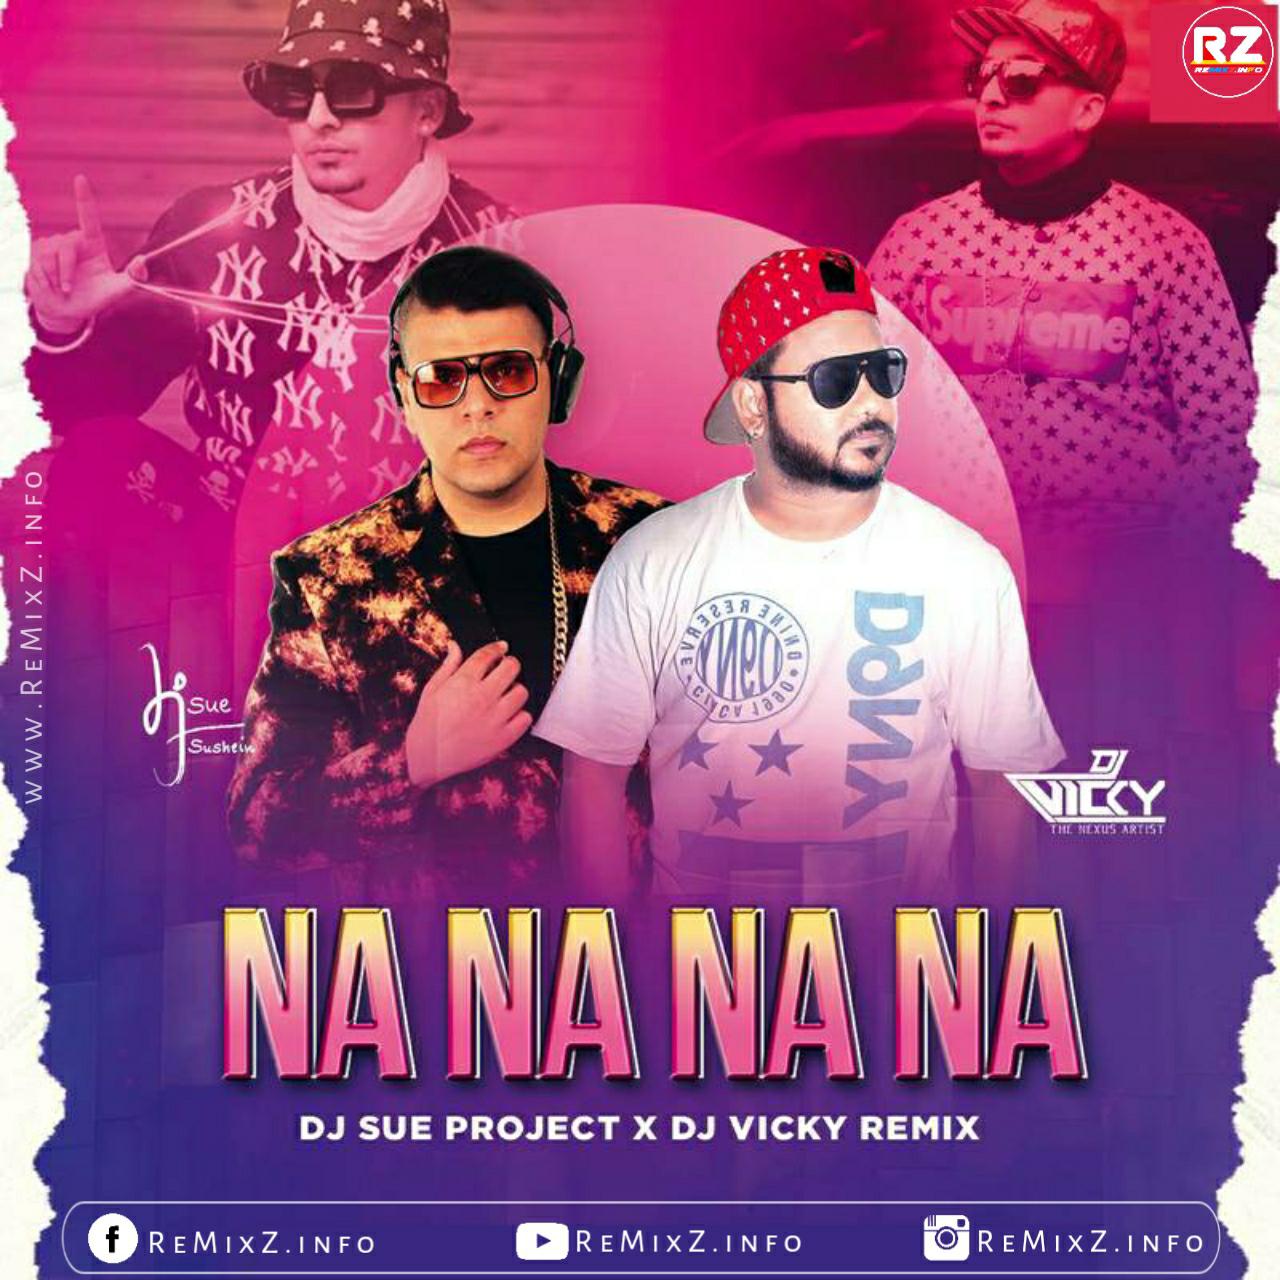 na-na-na-na-remix-j-star-dj-sue-project-dj-vicky.jpg